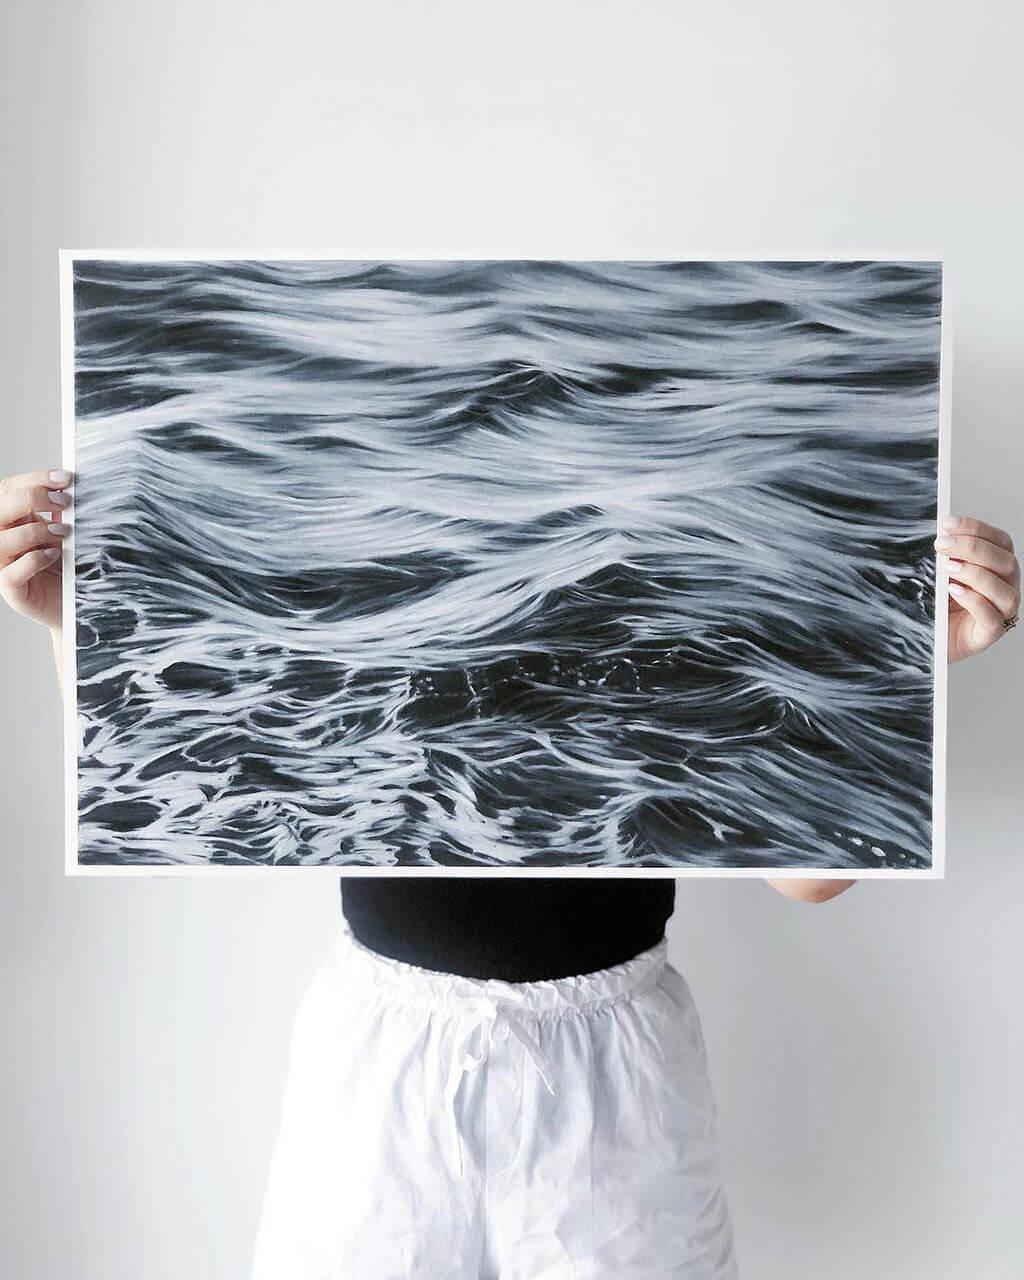 Hyper-realistic-pencil drawings